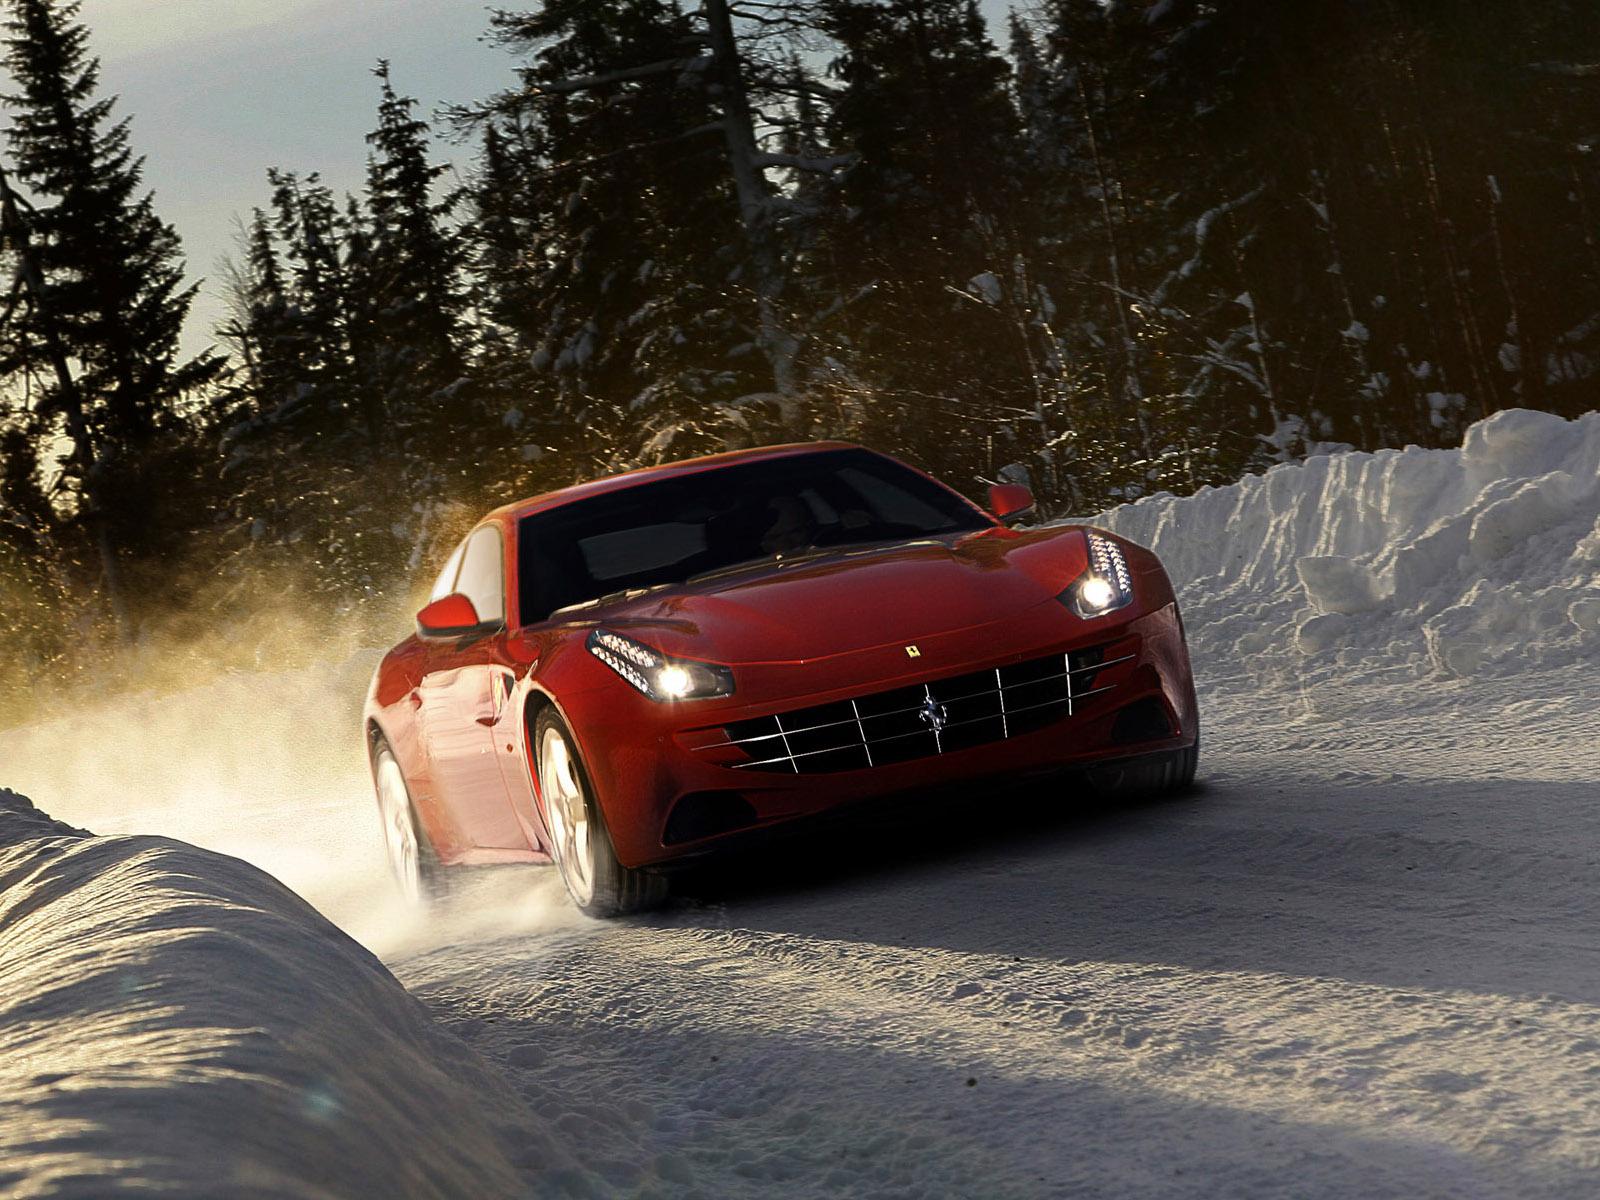 Ferrari ранним утром бесплатно